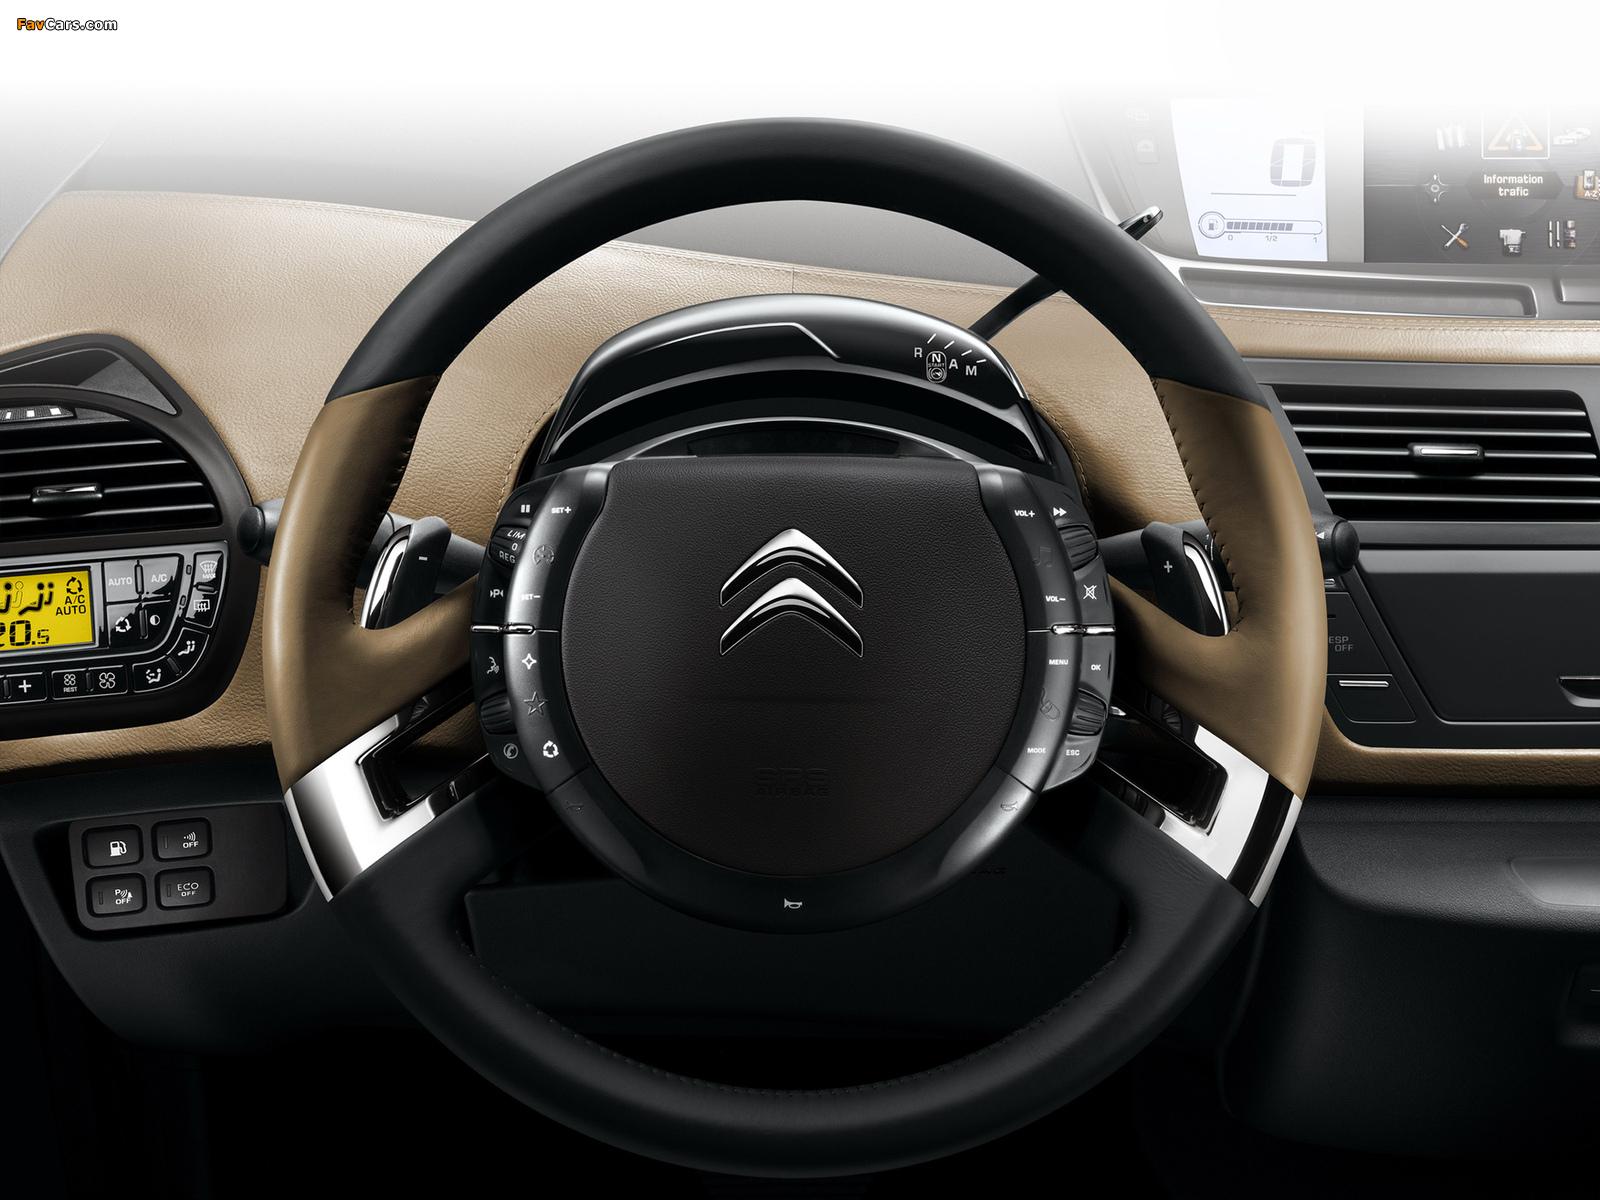 Citroën C4 Picasso 2010 photos (1600 x 1200)